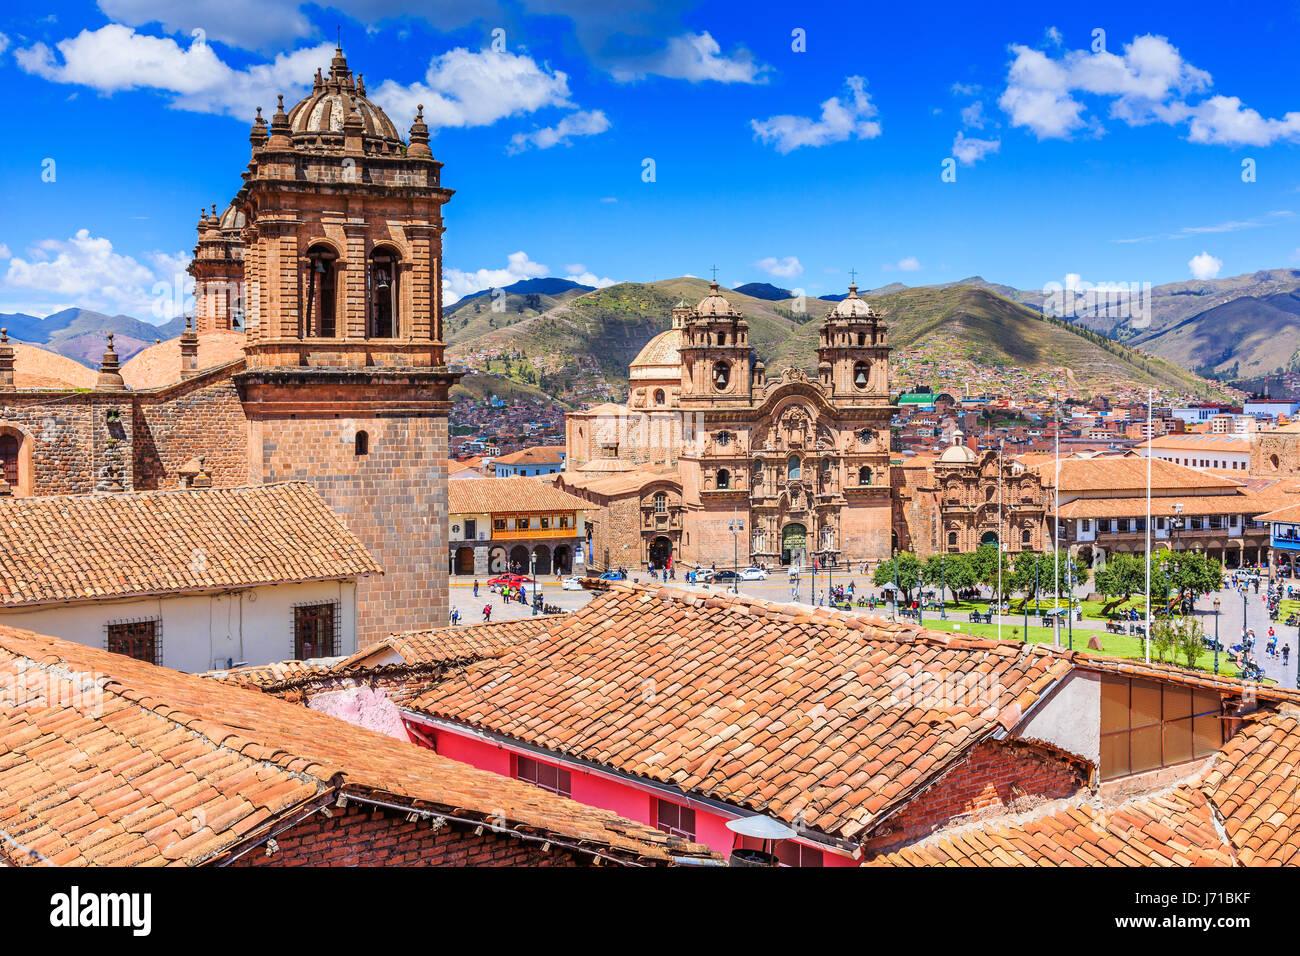 Cusco, Pérou la capitale historique de l'Empire Inca. Plaza de Armas. Photo Stock